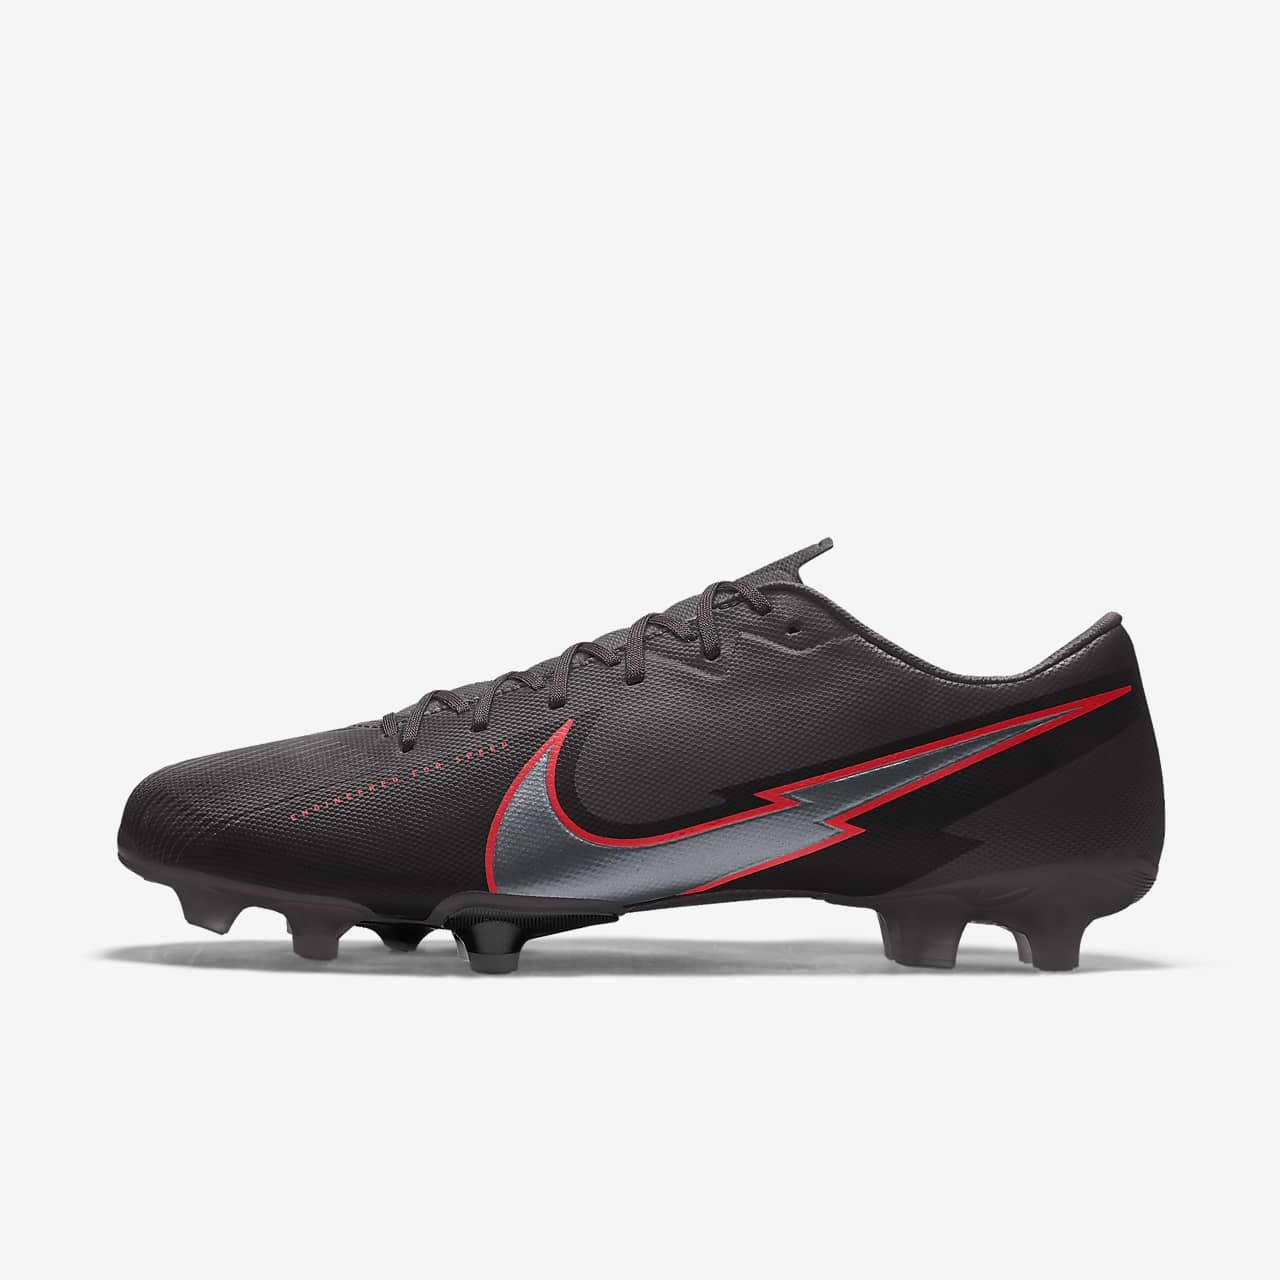 Nike Mercurial Vapor 13 Academy By You Custom Firm-Ground Football Boot